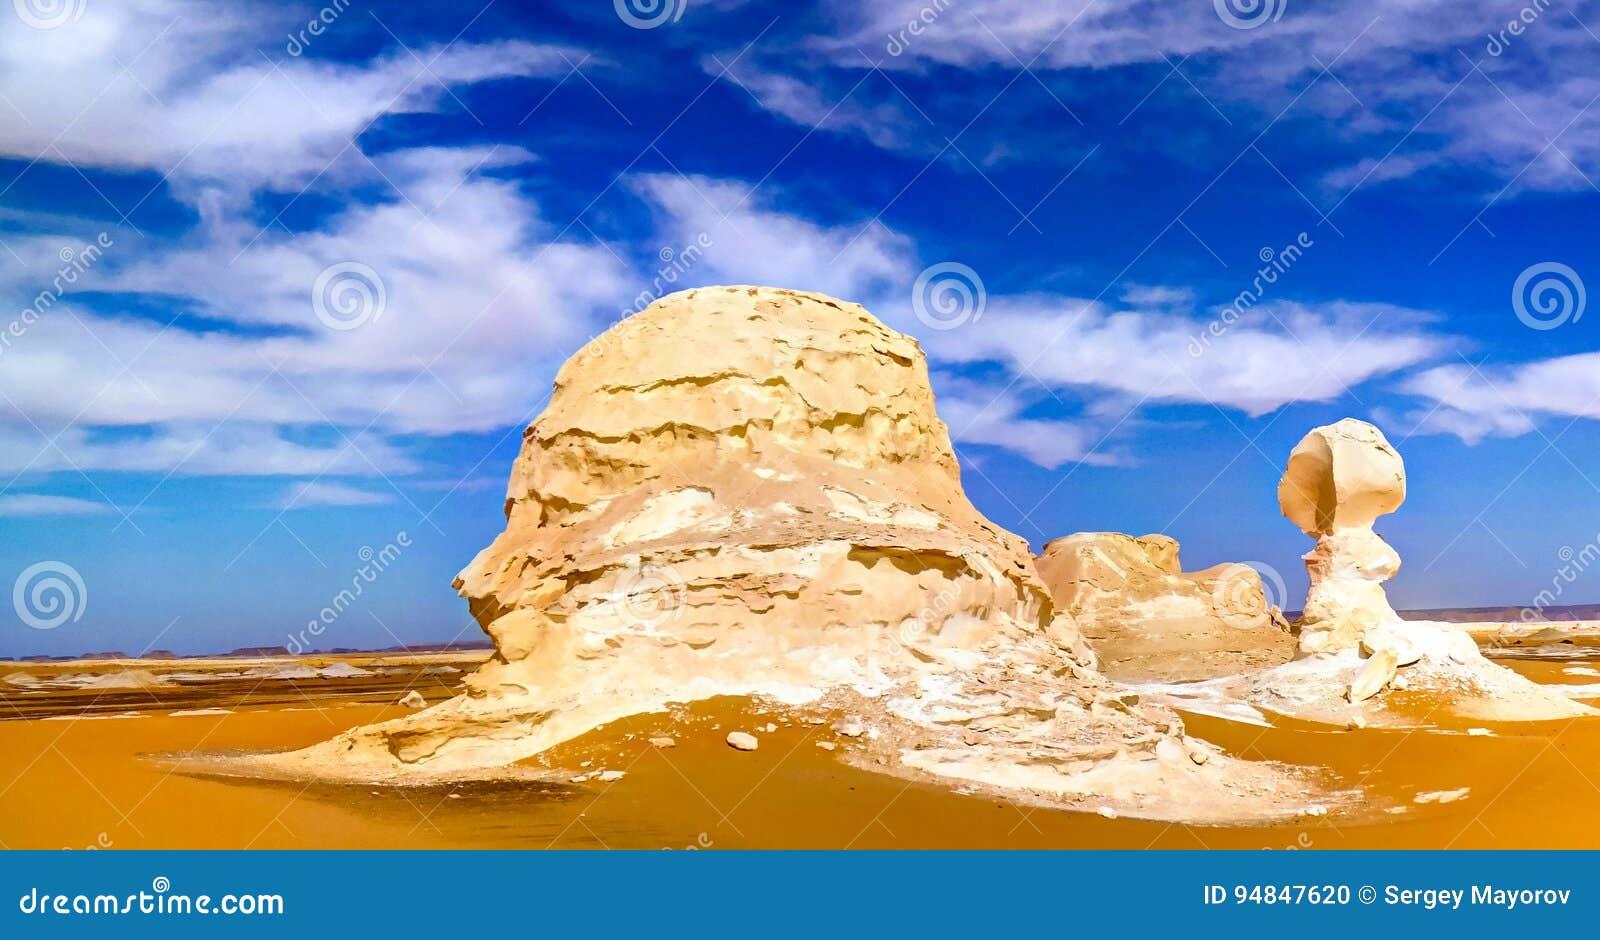 Абстрактные скульптуры горных пород природы aka, белая пустыня, Сахара, Египет